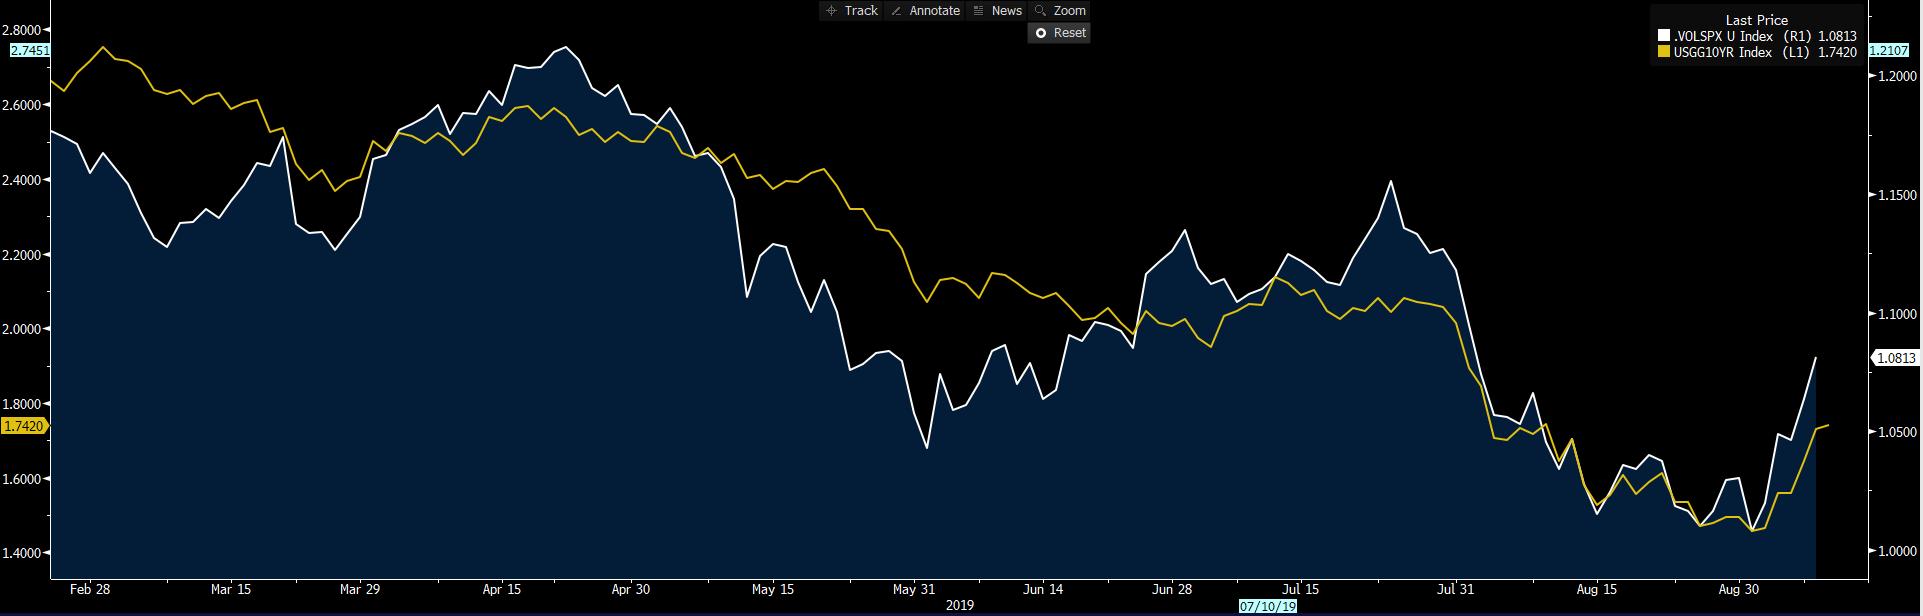 Yellow: S&P 500 high beta / low vol sector ratio. White: US 10-year treasury.